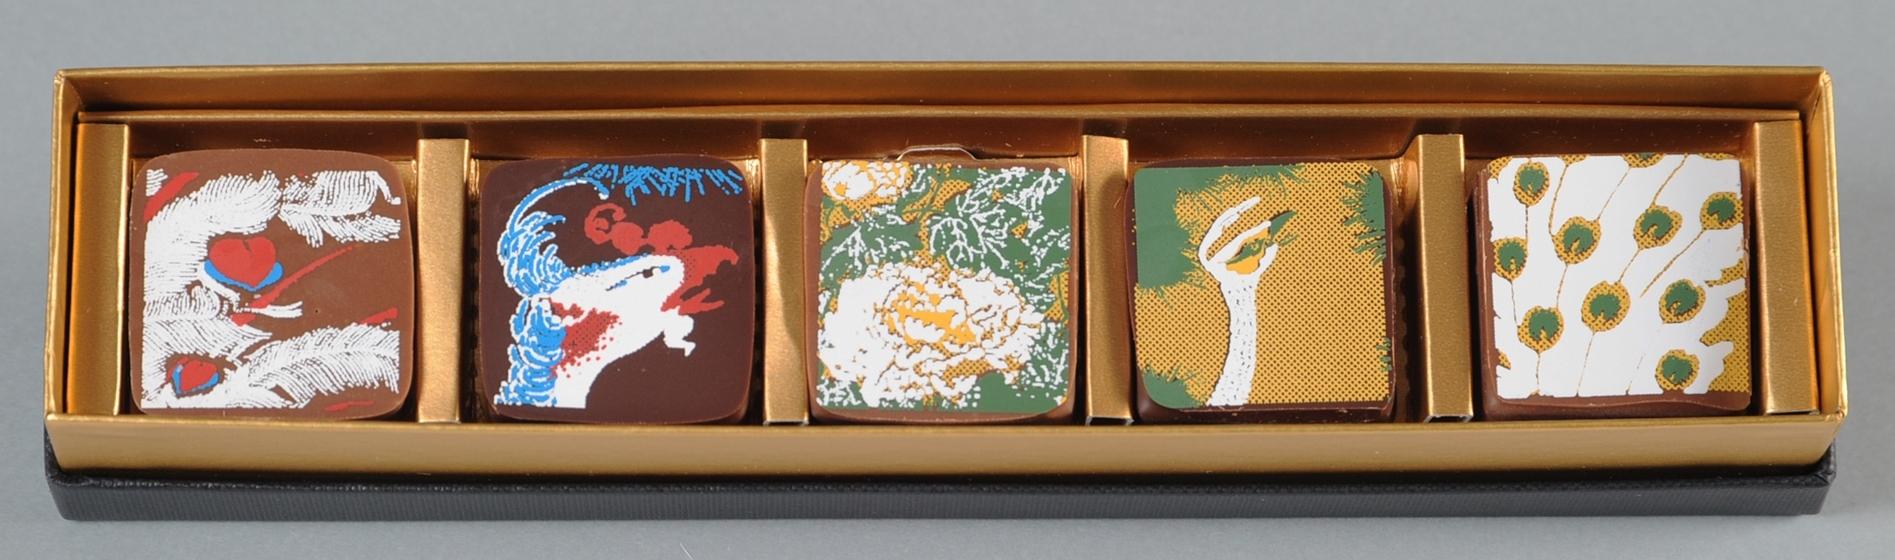 Okada Museum Chocolate 『若冲・孔雀鳳凰』2,800 円(税込)